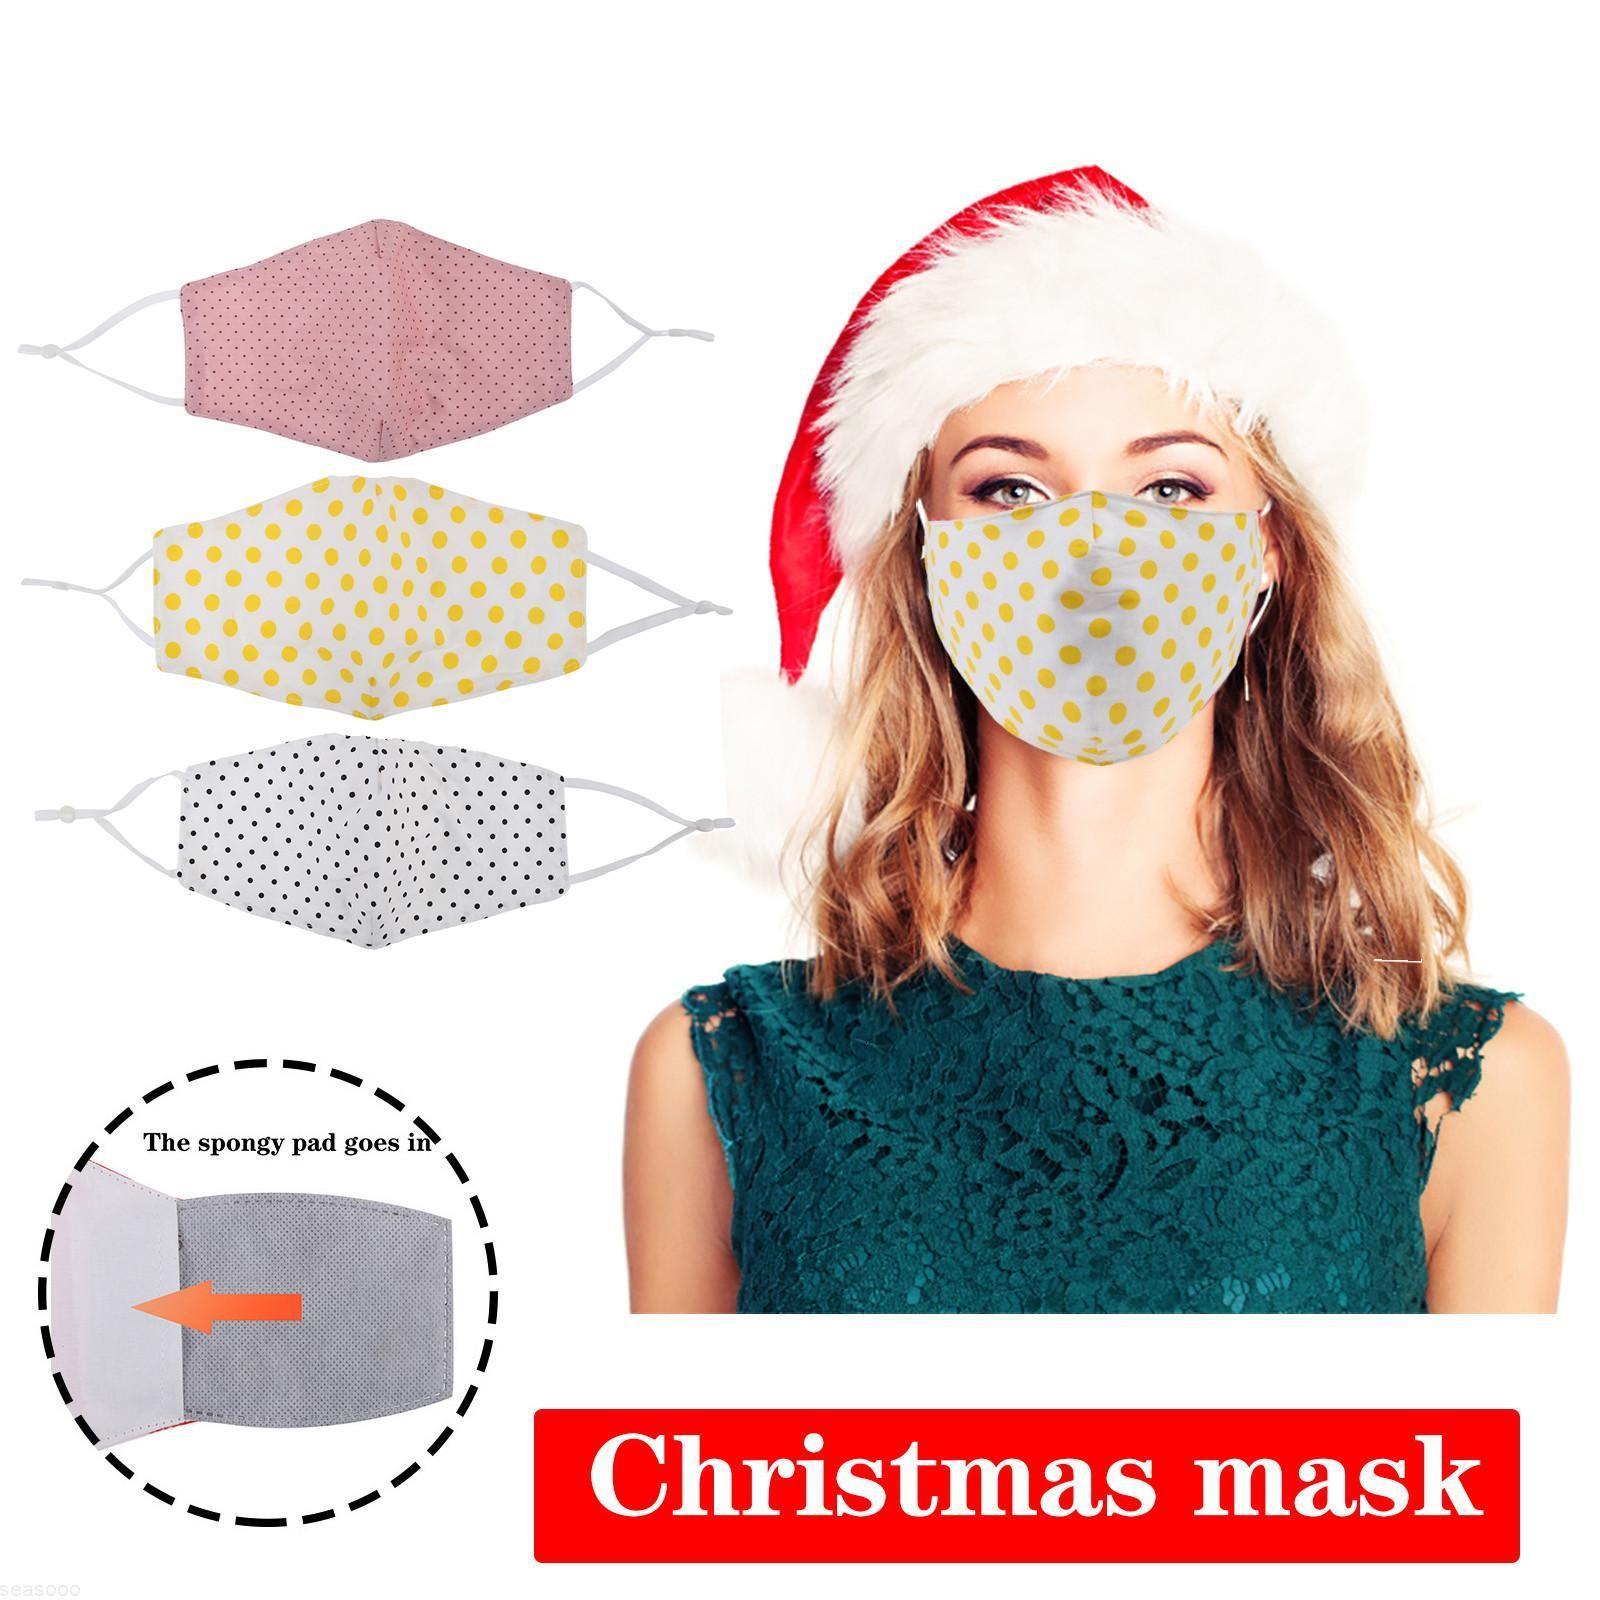 Máscaras de boca Lavável Boca Boné Imprimir Headband Bandana Mulheres Mouthmask Mondkapje Imprimir Kerst Mondmasker Mascarillas Masque Masque Maske Sqcrzp